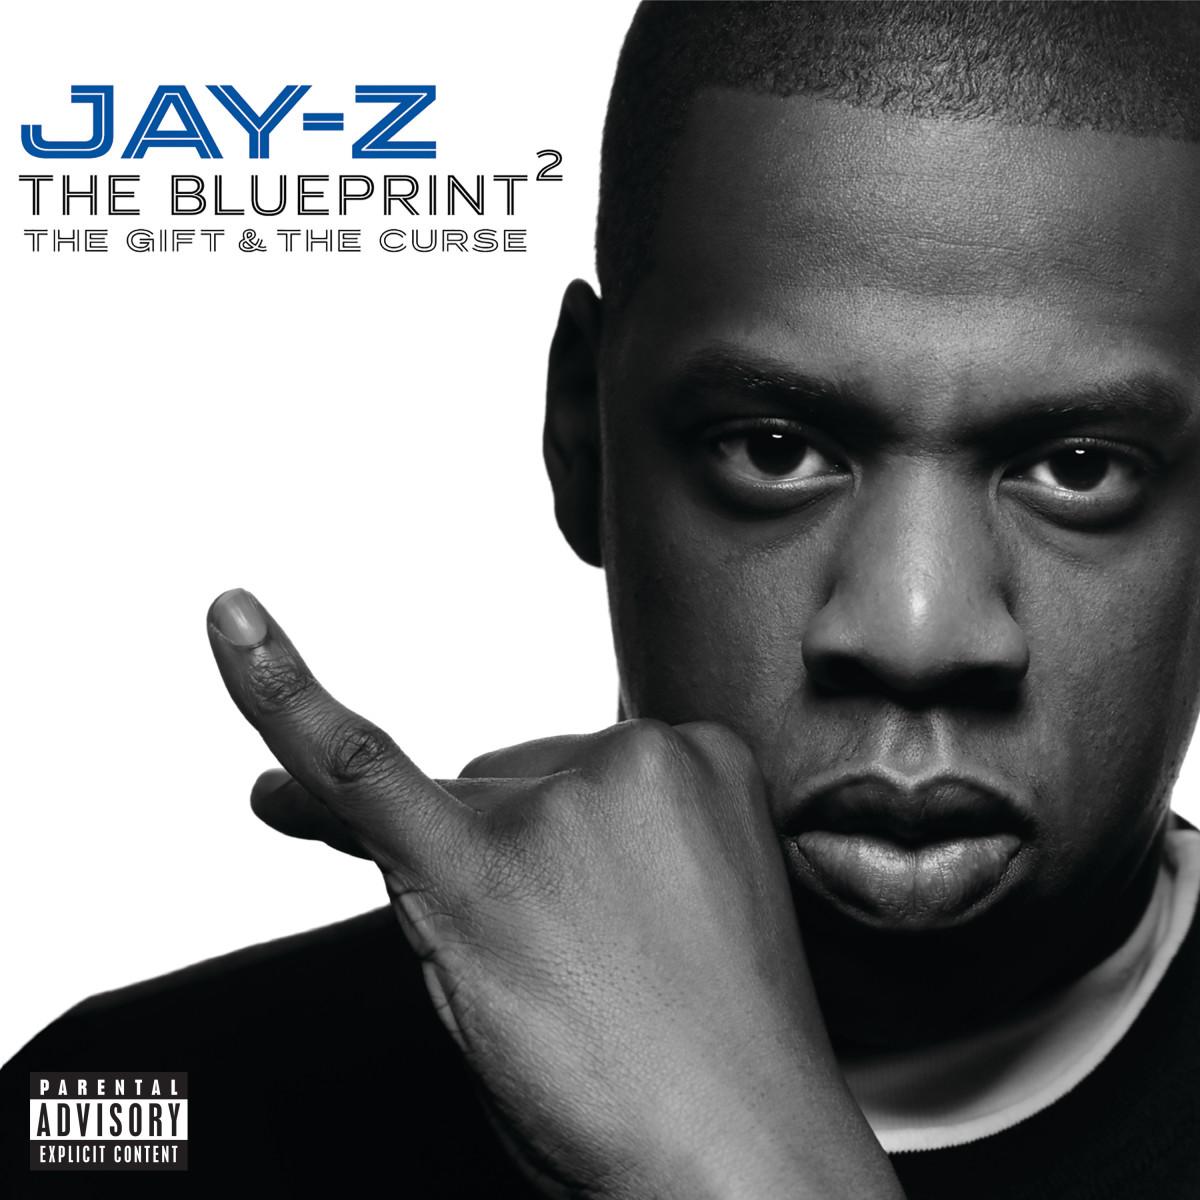 jay-z-the-blueprint-2